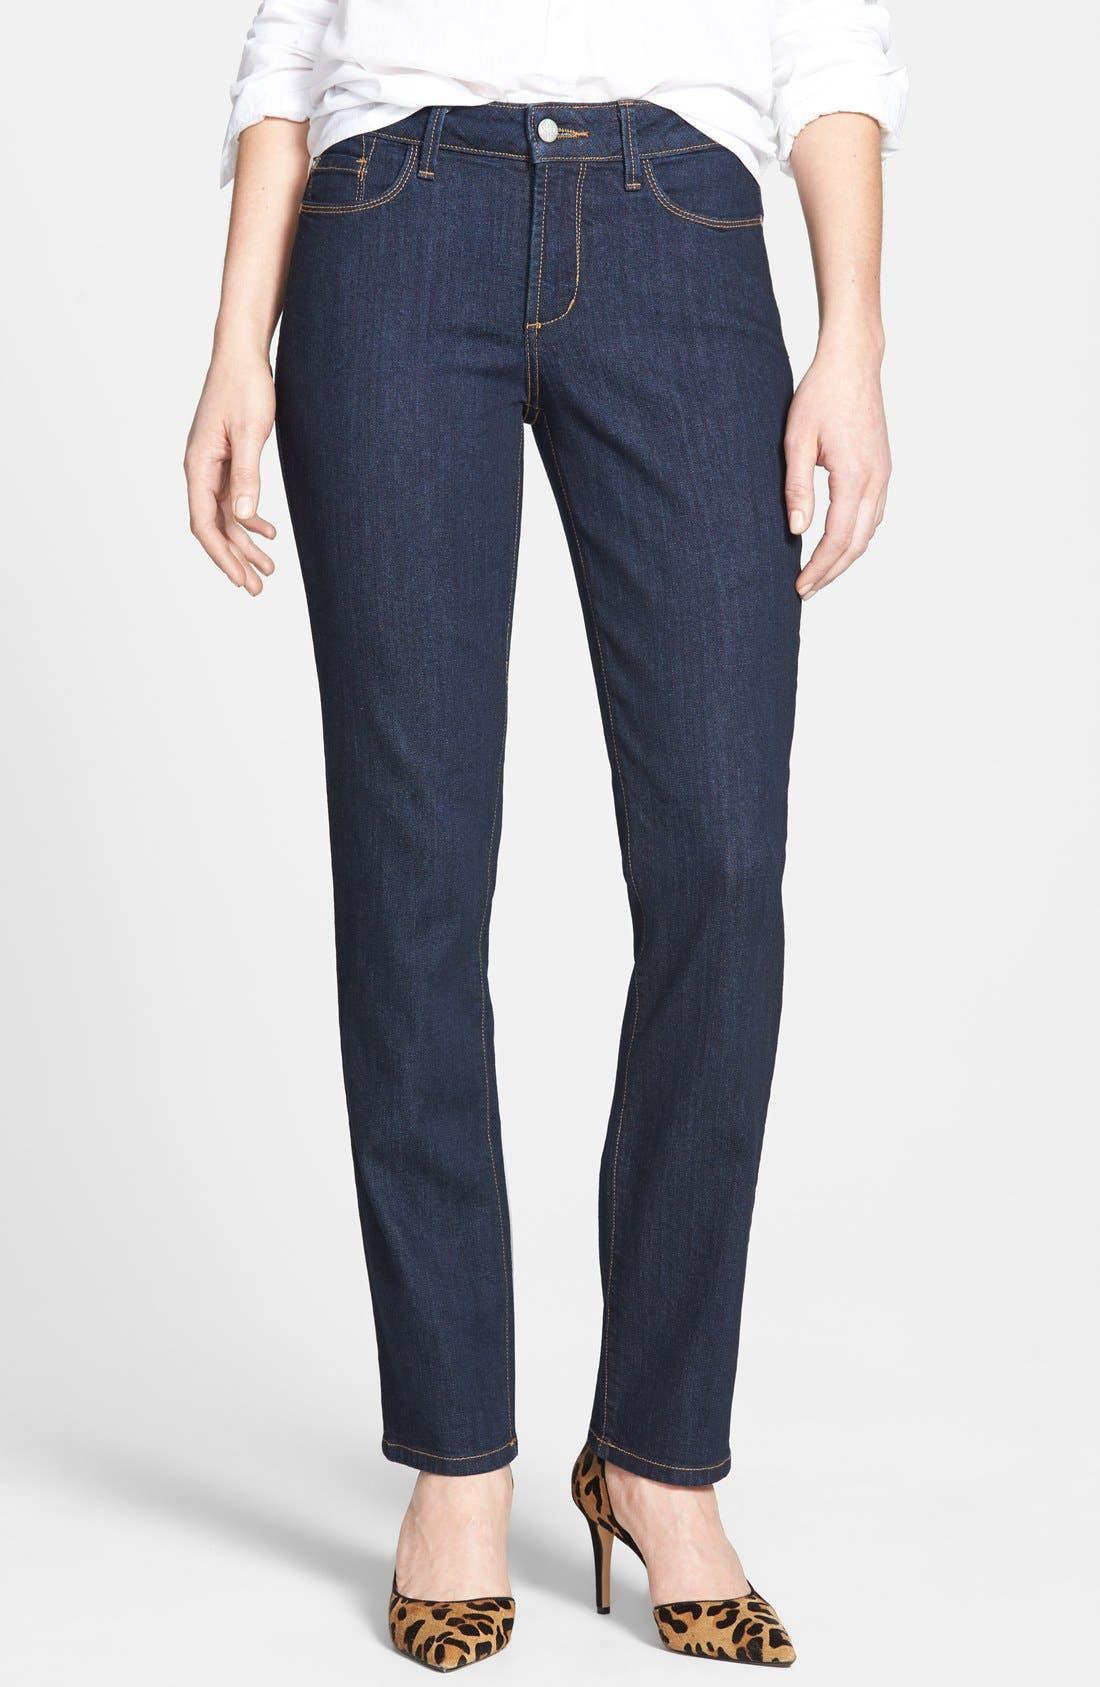 Main Image - NYDJ 'Sheri' Stretch Skinny Jeans (Larchmont) (Online Only)